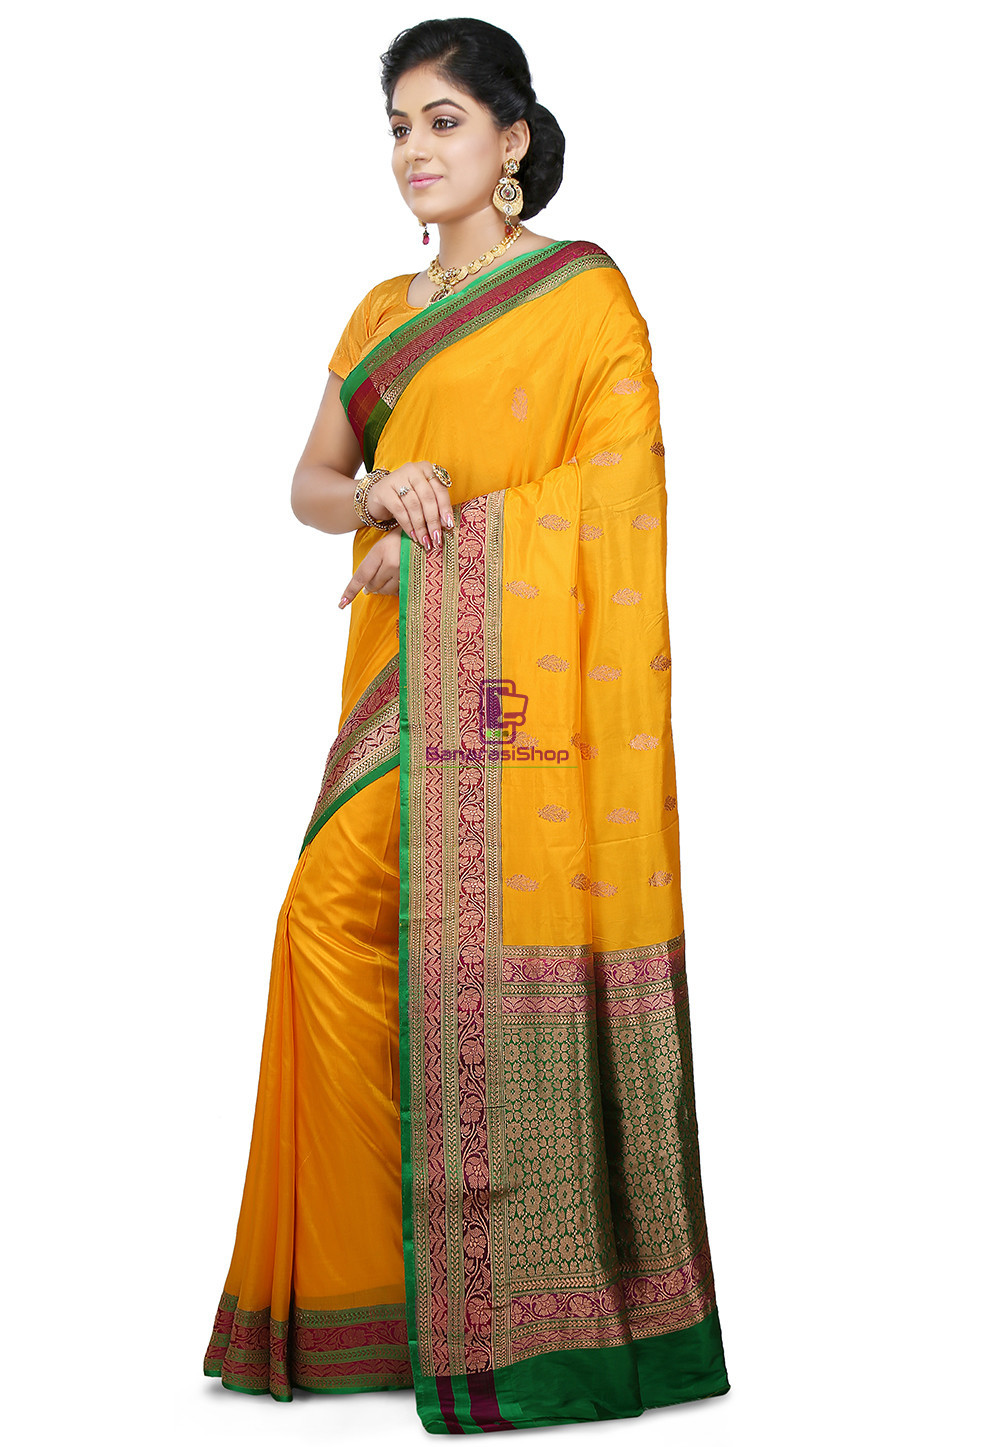 Banarasi Pure Katan Silk Handloom Saree in Yellow 4